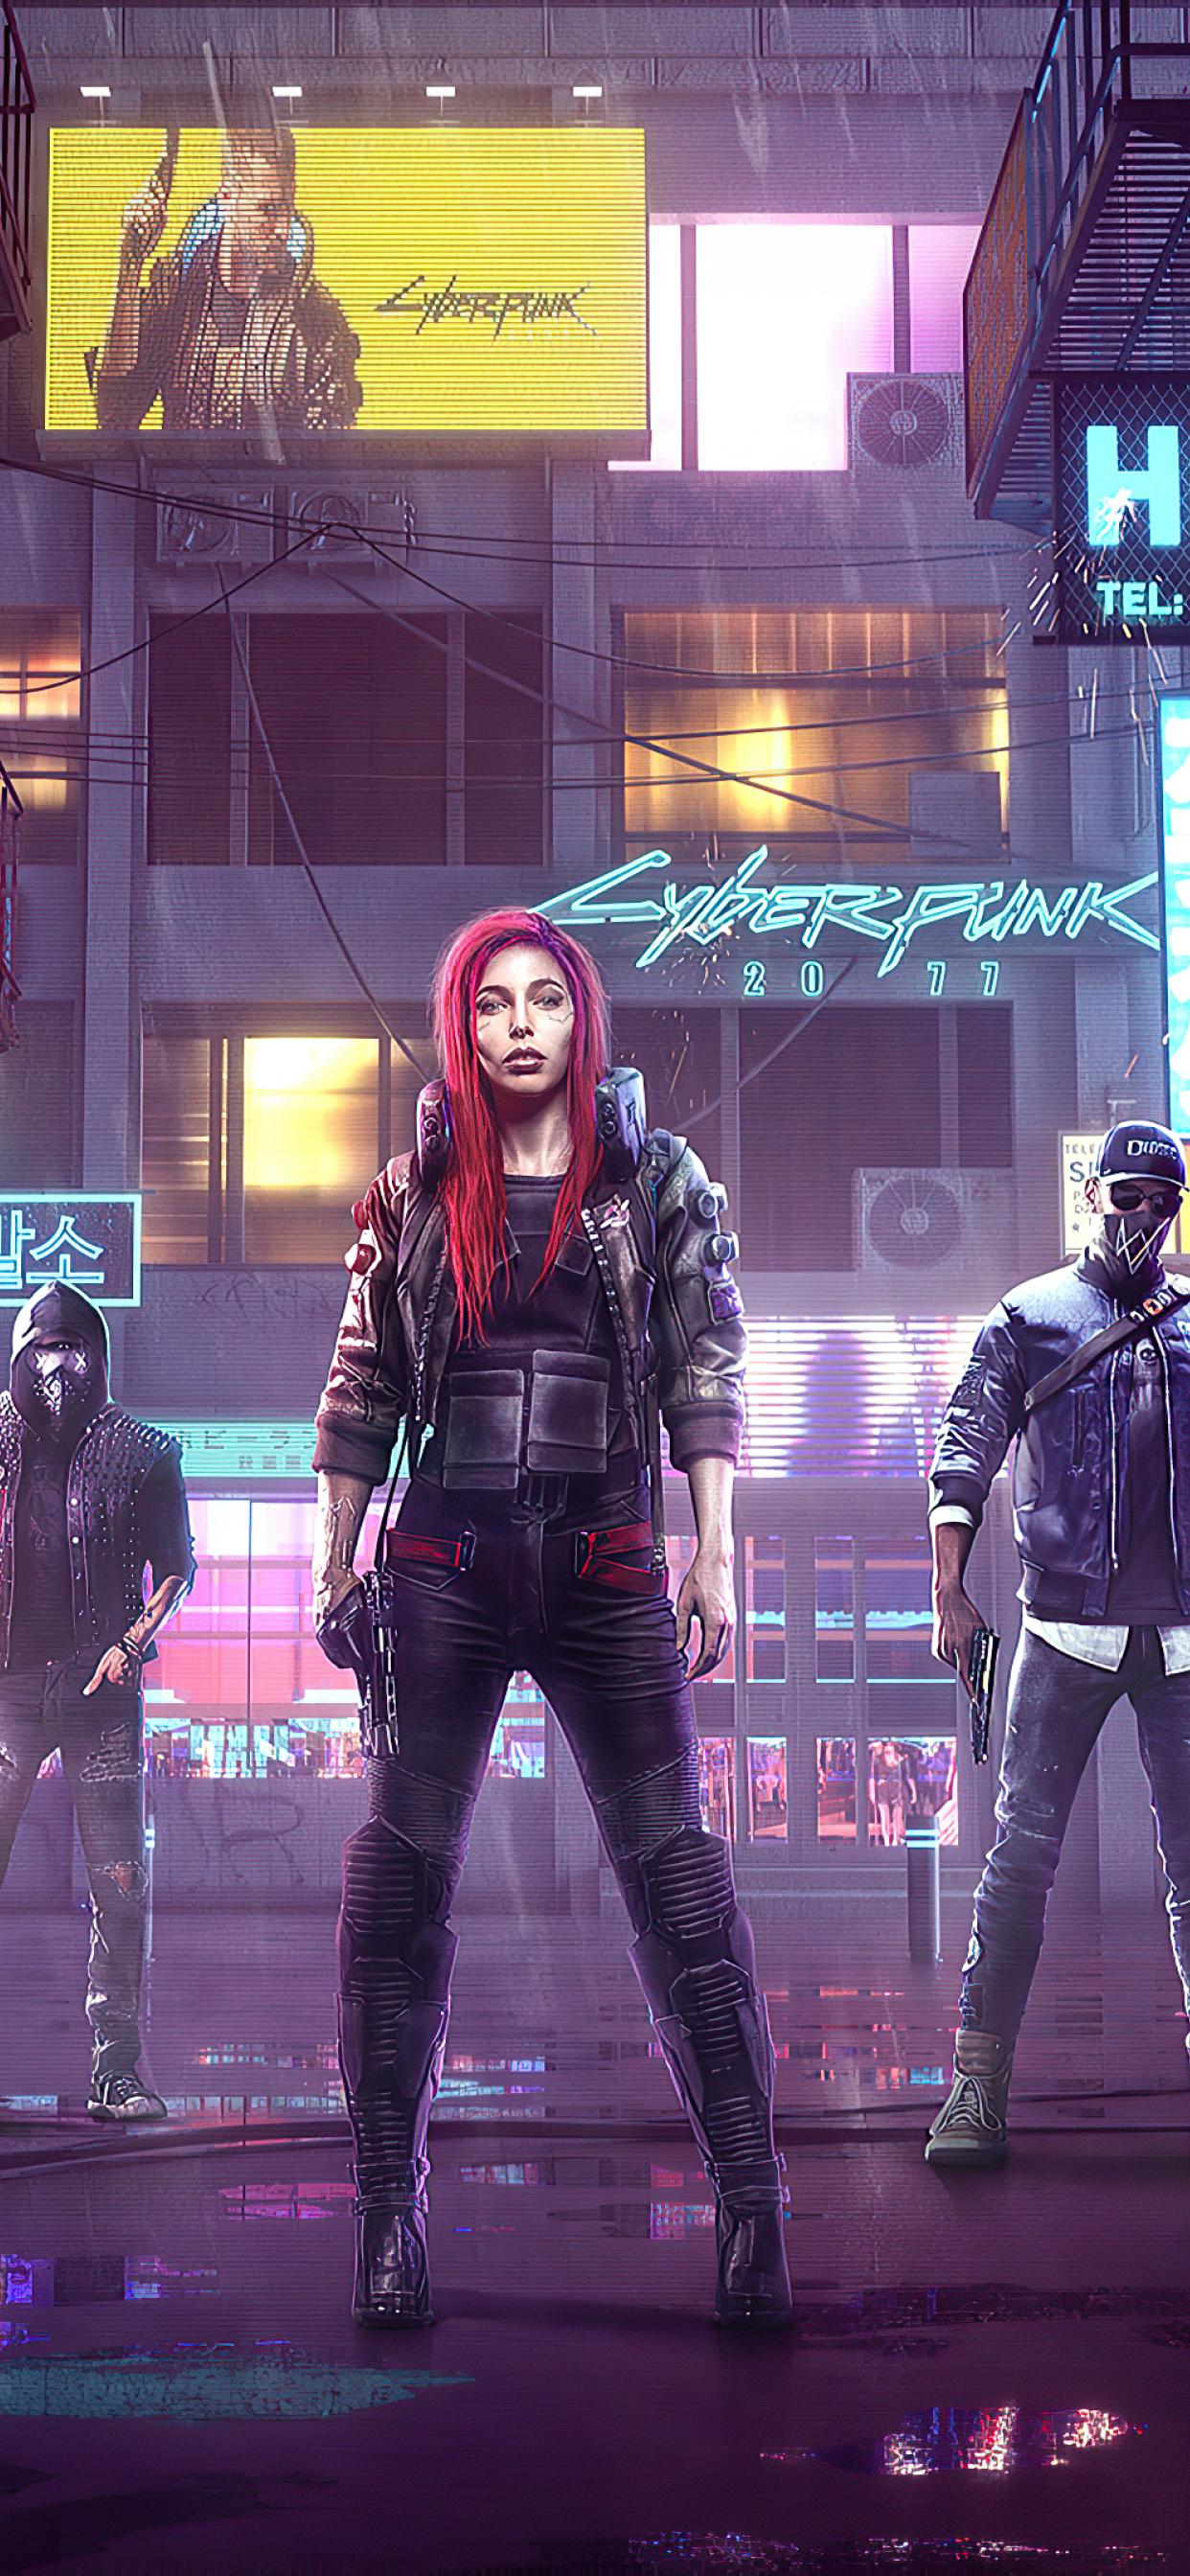 1242x2688 Cyberpunk 2077 Game Poster Iphone XS MAX ...